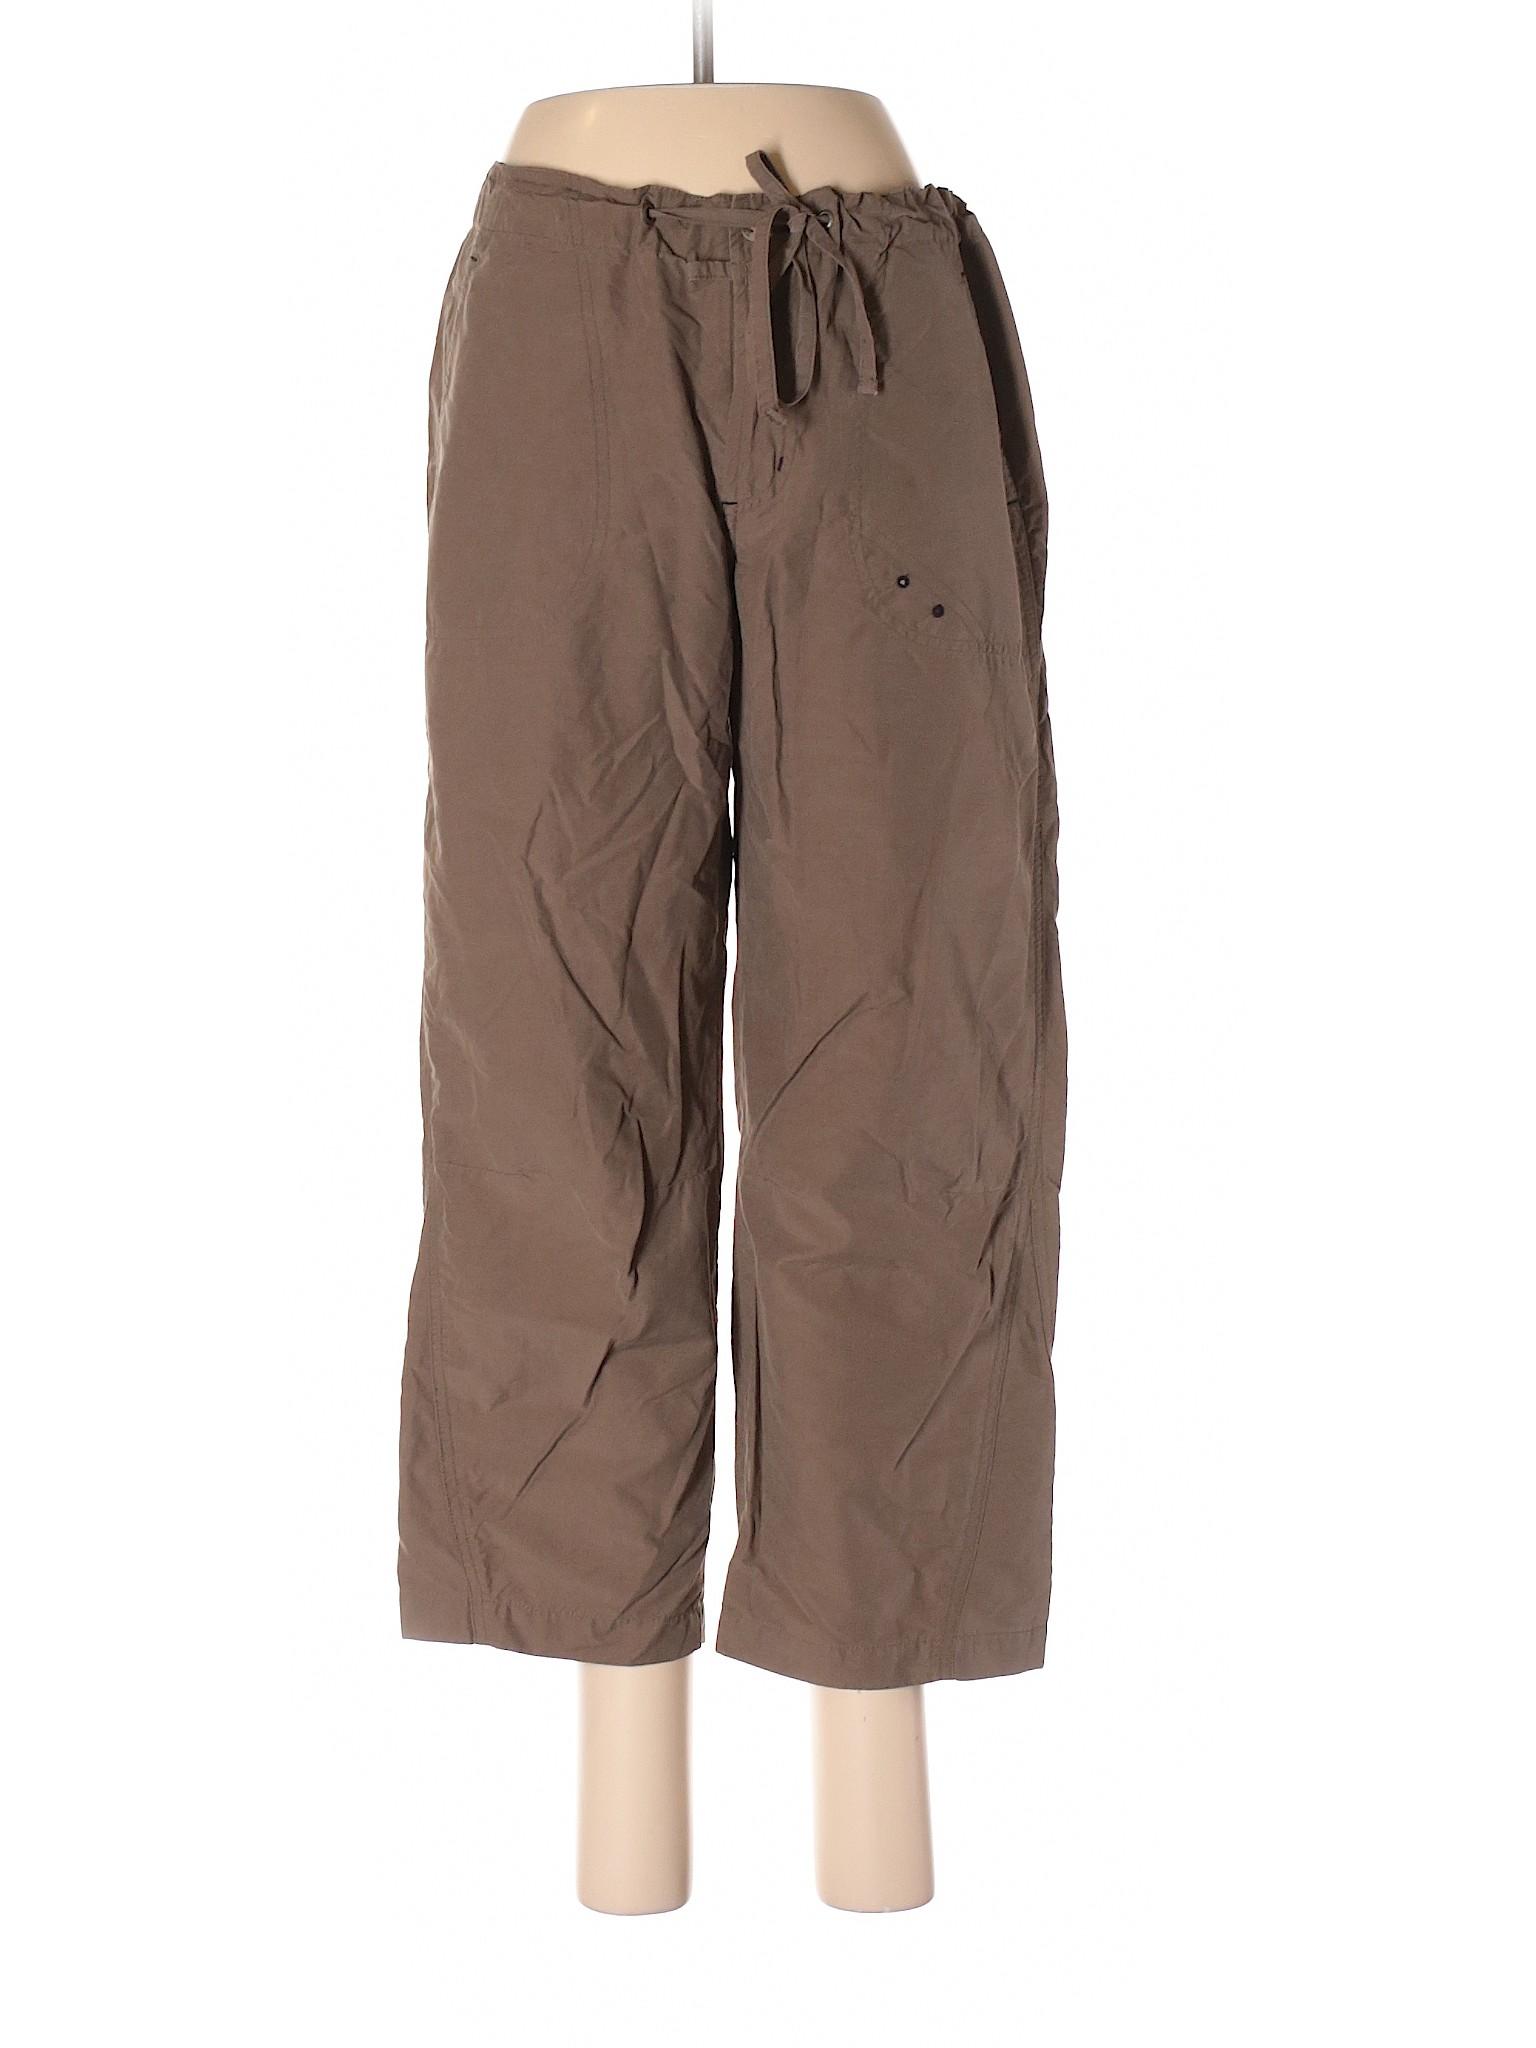 Casual winter Pants Columbia Boutique winter Boutique SnYqETx